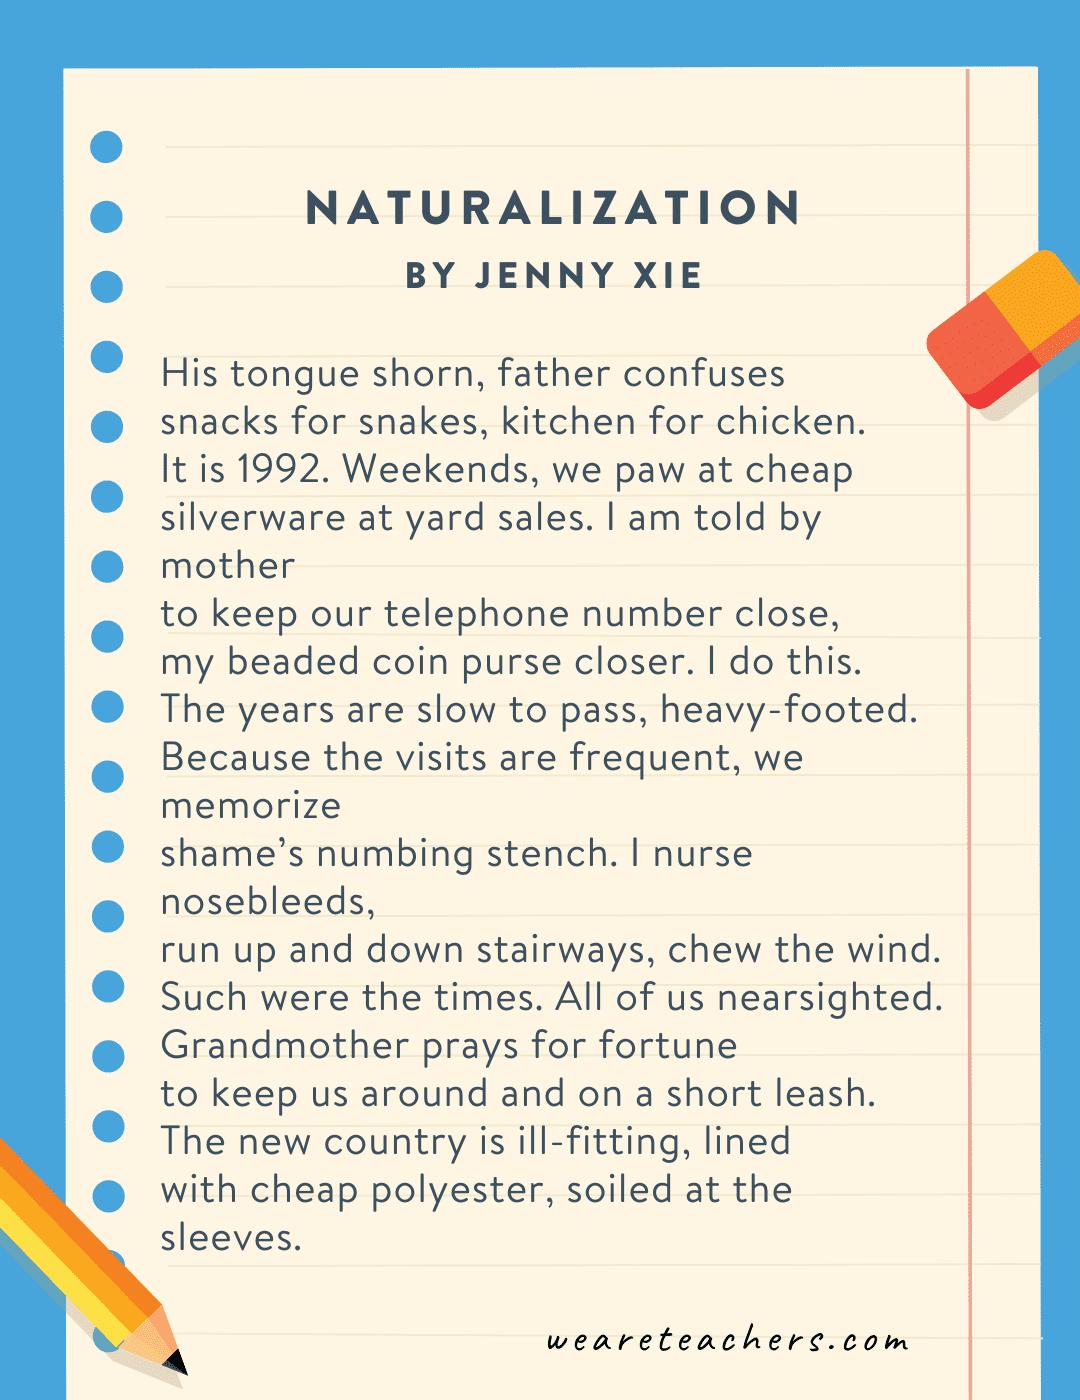 Naturalization by Jenny Xie